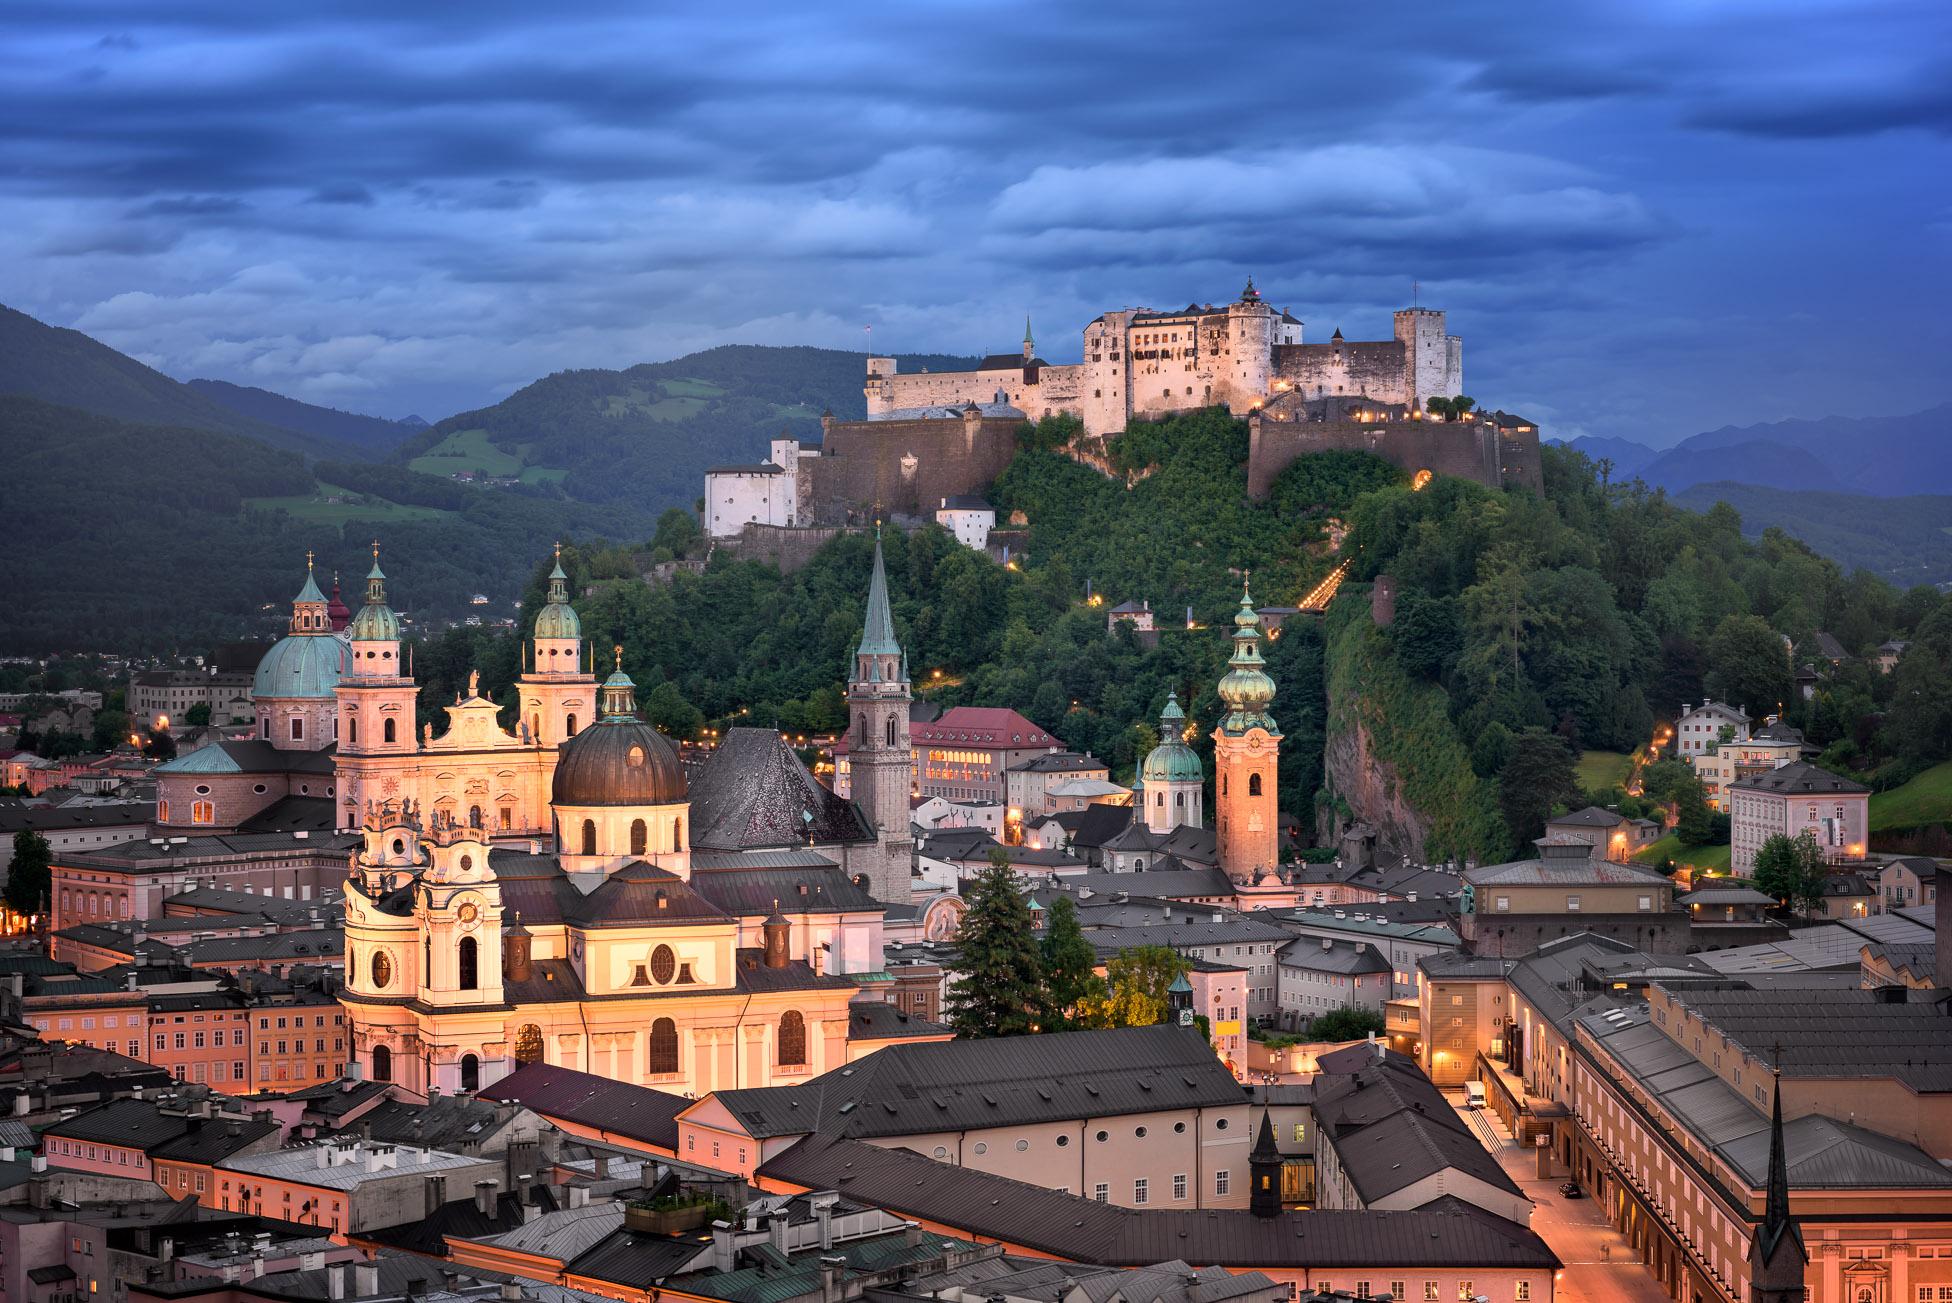 Aerial View of Salzburg in the Evening, Austria